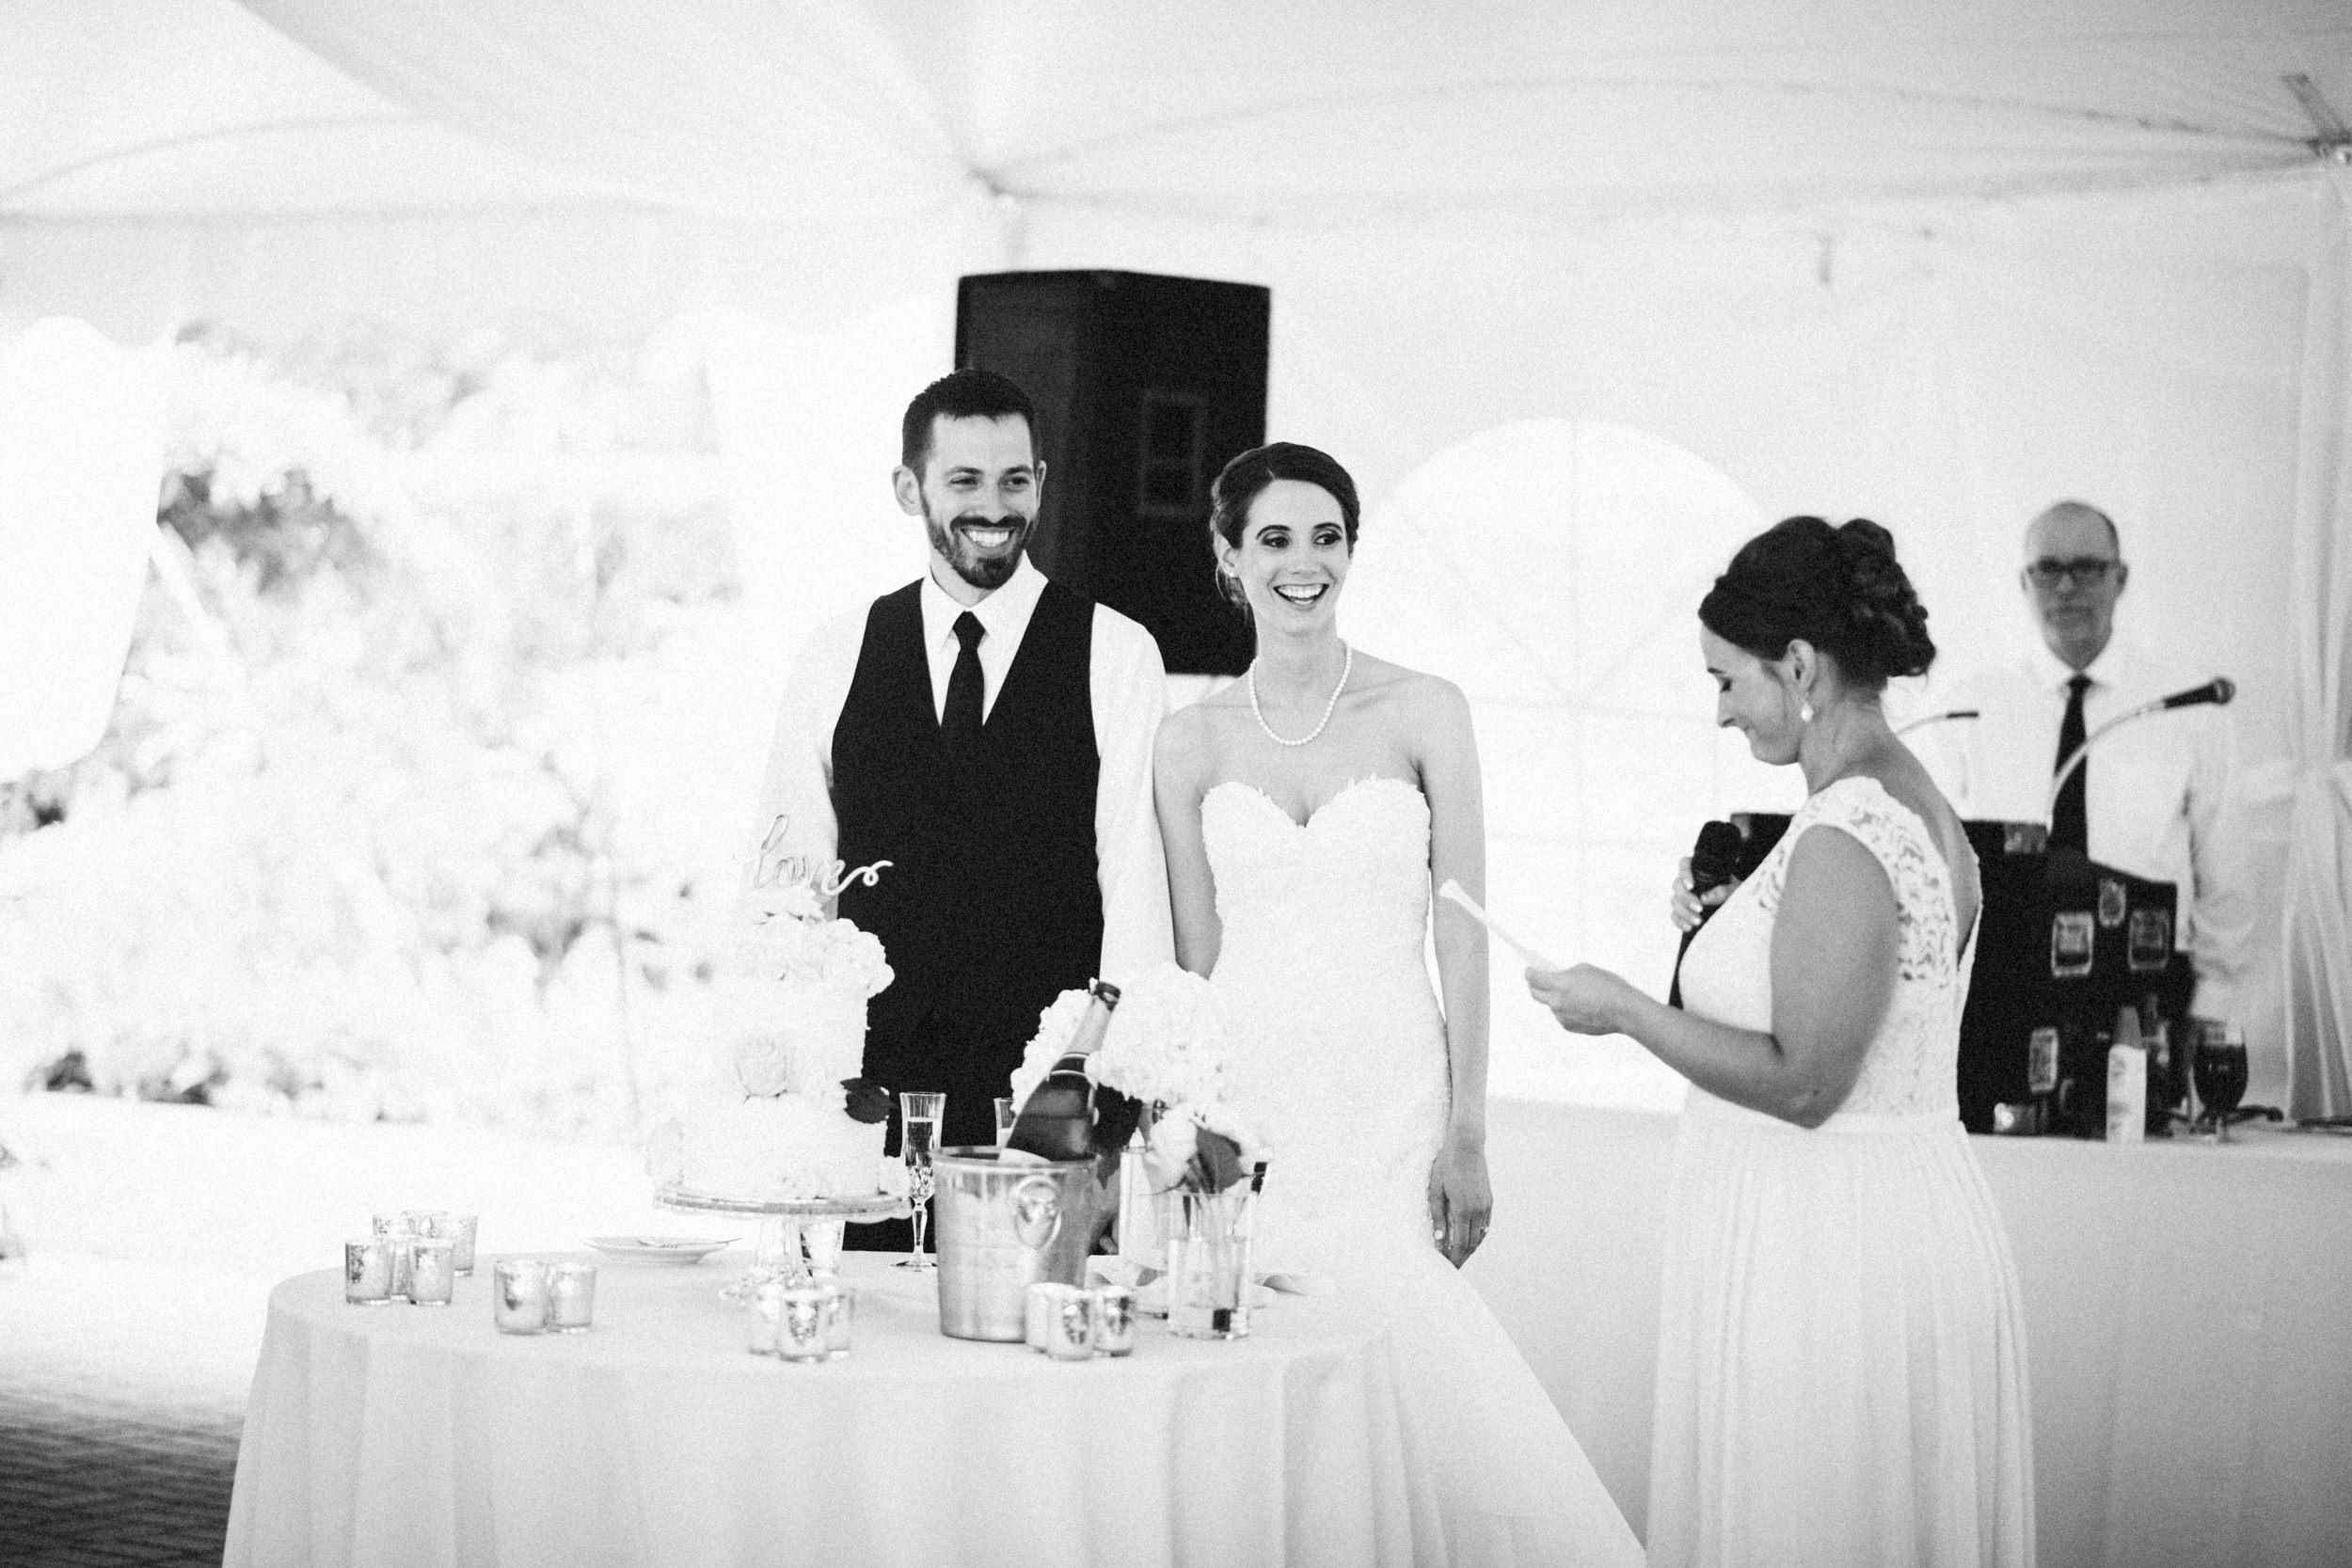 Louisville-Kentucky-Wedding-Elopement-Photographer-Sarah-Katherine-Davis-Photography-Whitehall-Classic-Timeless-Garden-Wedding-631.jpg